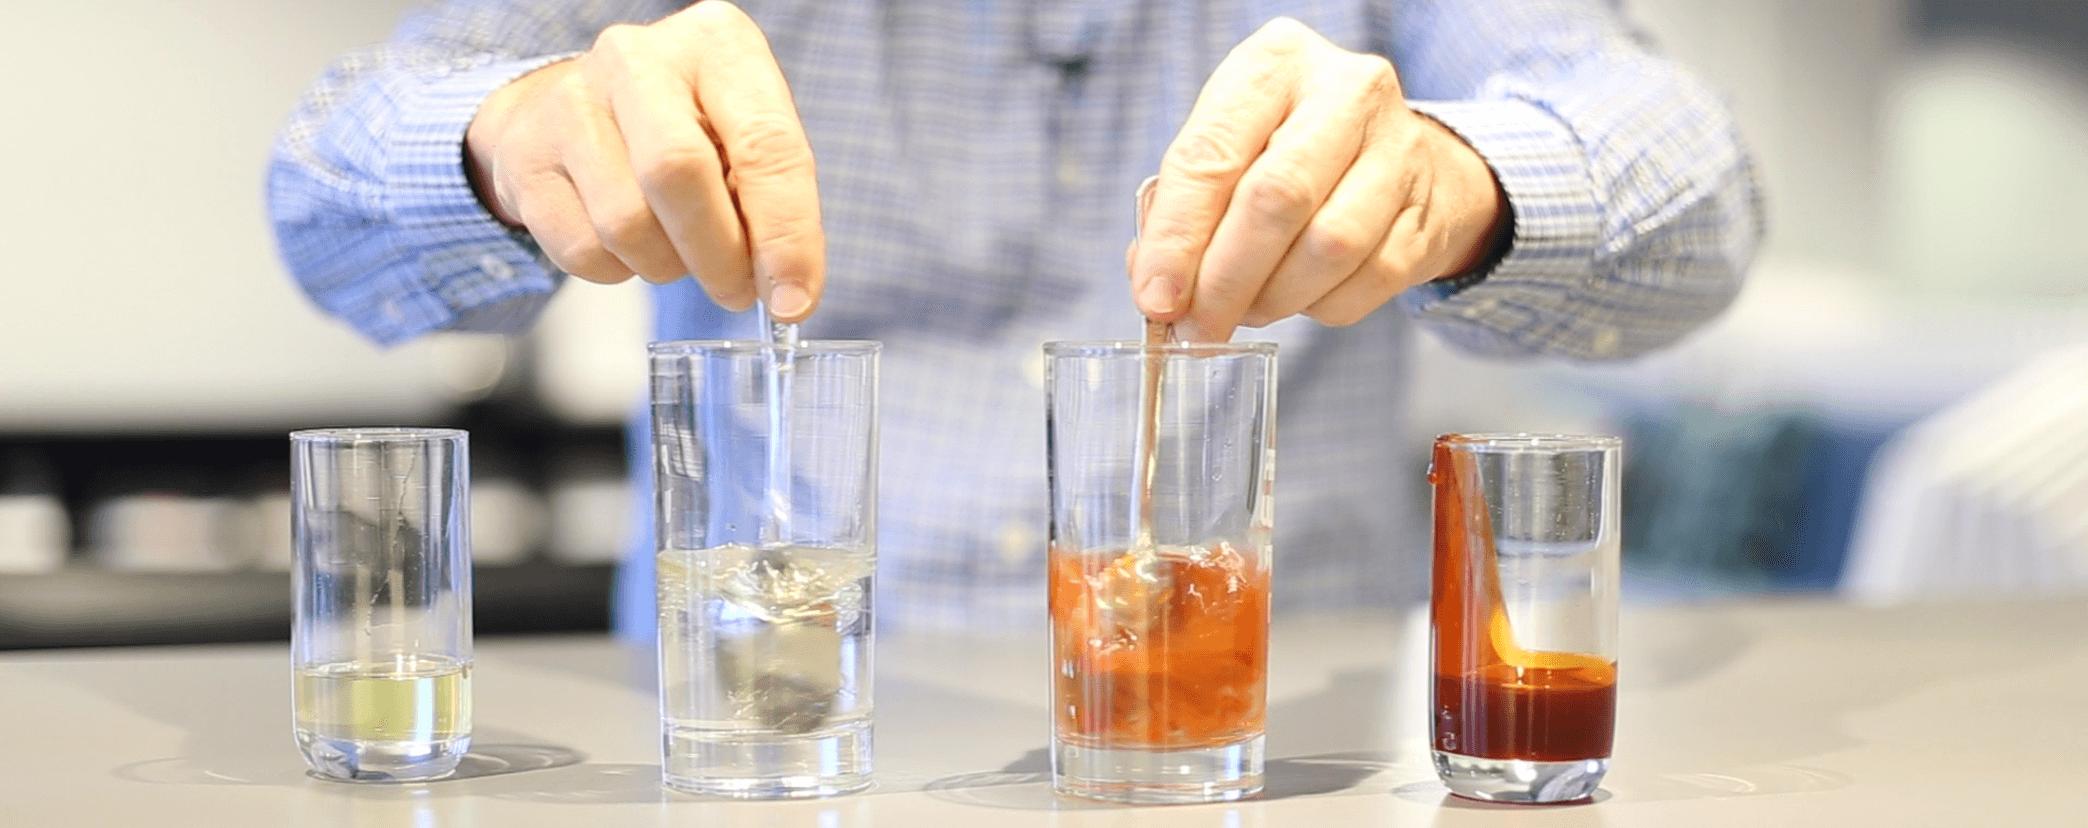 krill oil versus fish oil omega 3 test.png